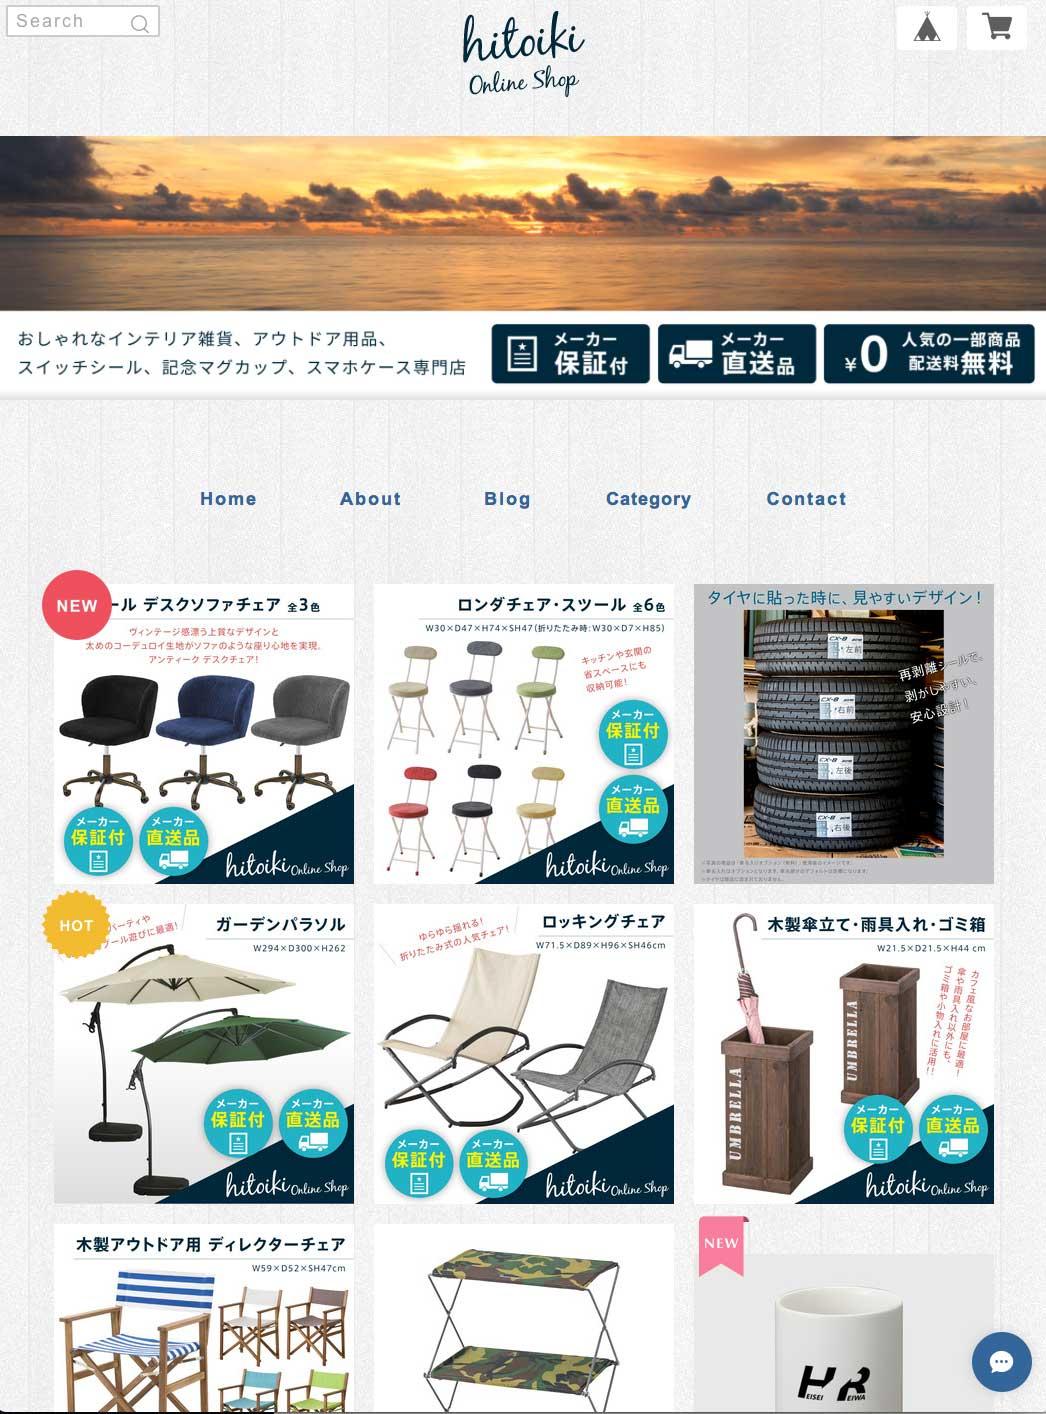 hitoiki(ひといき)運営の公式通販ショップ一覧!Yahoo!や楽天市場、Amazonにも展開中! hitoiki_onlineshop